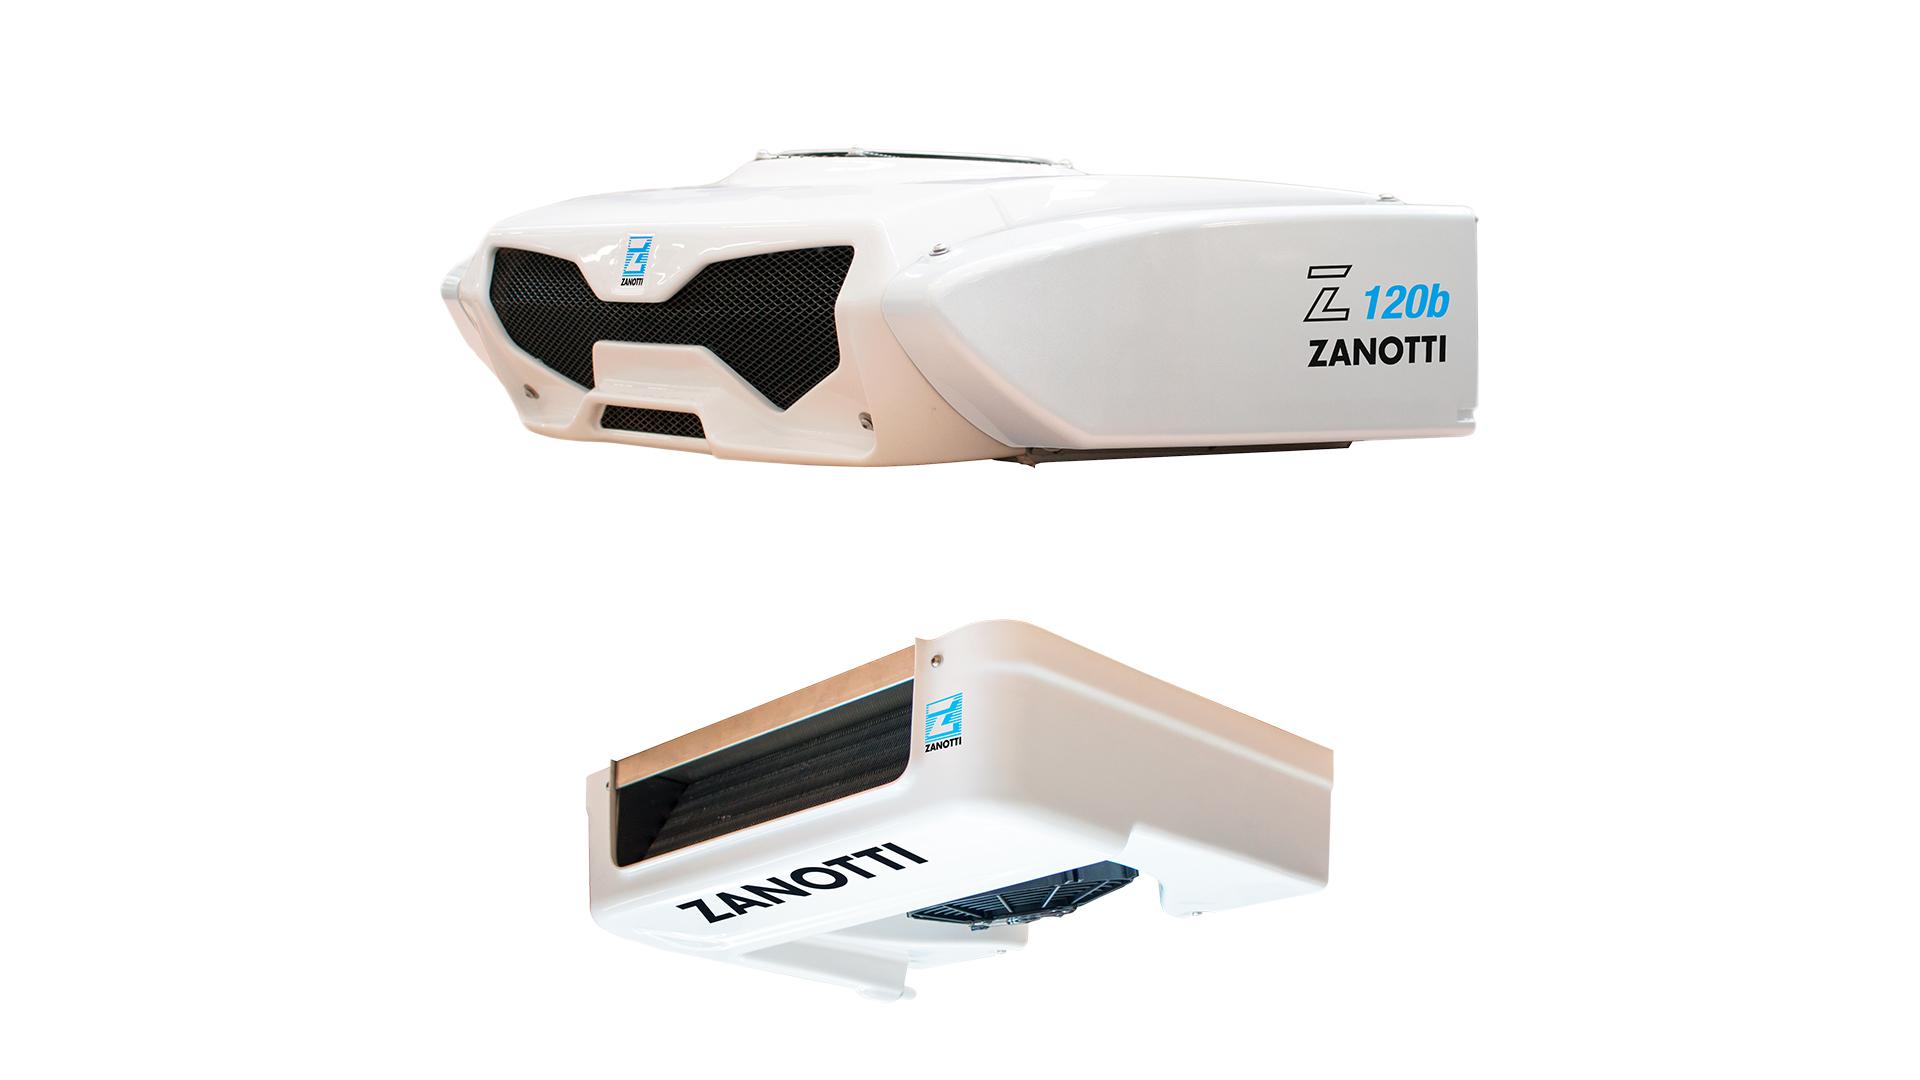 Electric refrigeration unit Zero 120b